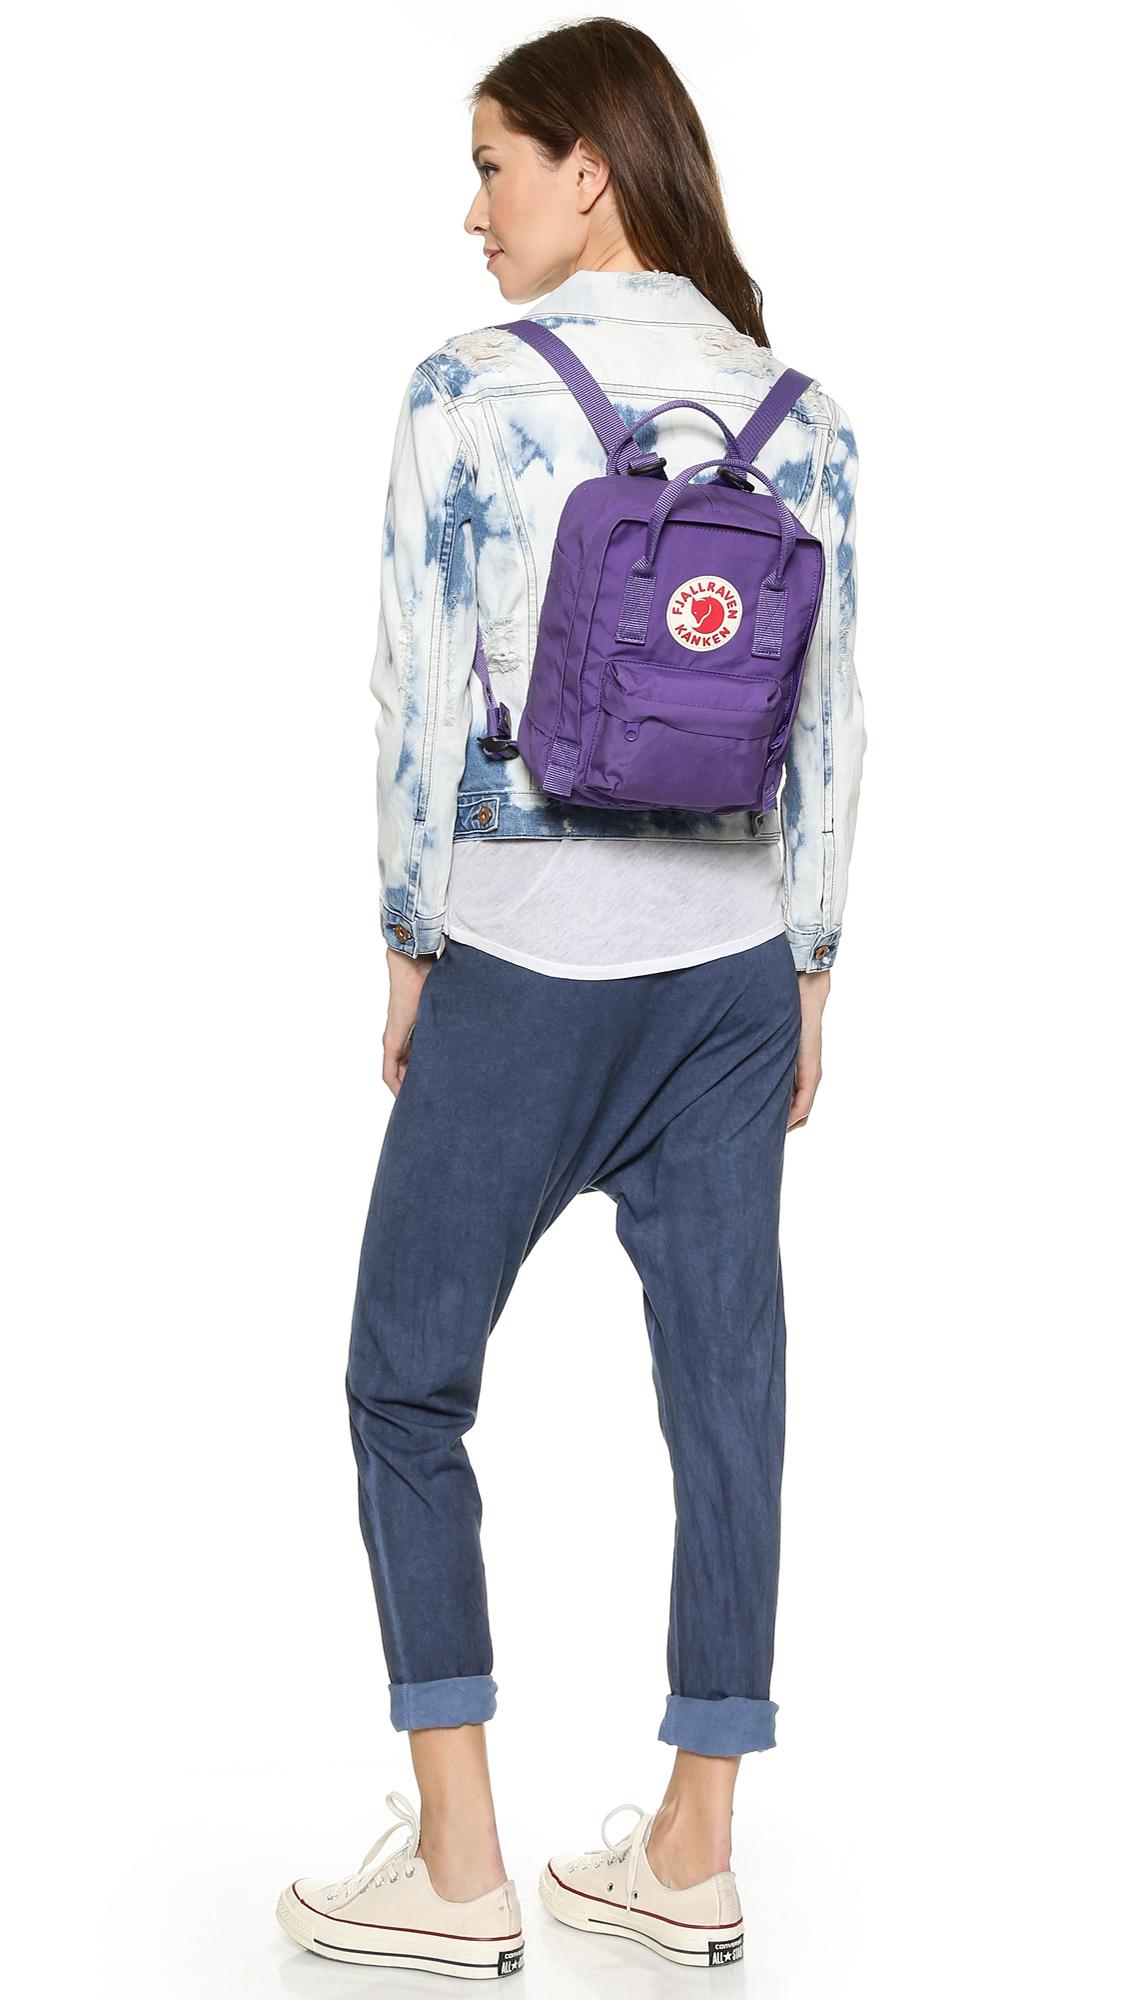 löparskor bra kvalitet stabil kvalitet Schoolbags & Backpacks School Bags, Pencil Cases & Sets Fjällräven ...